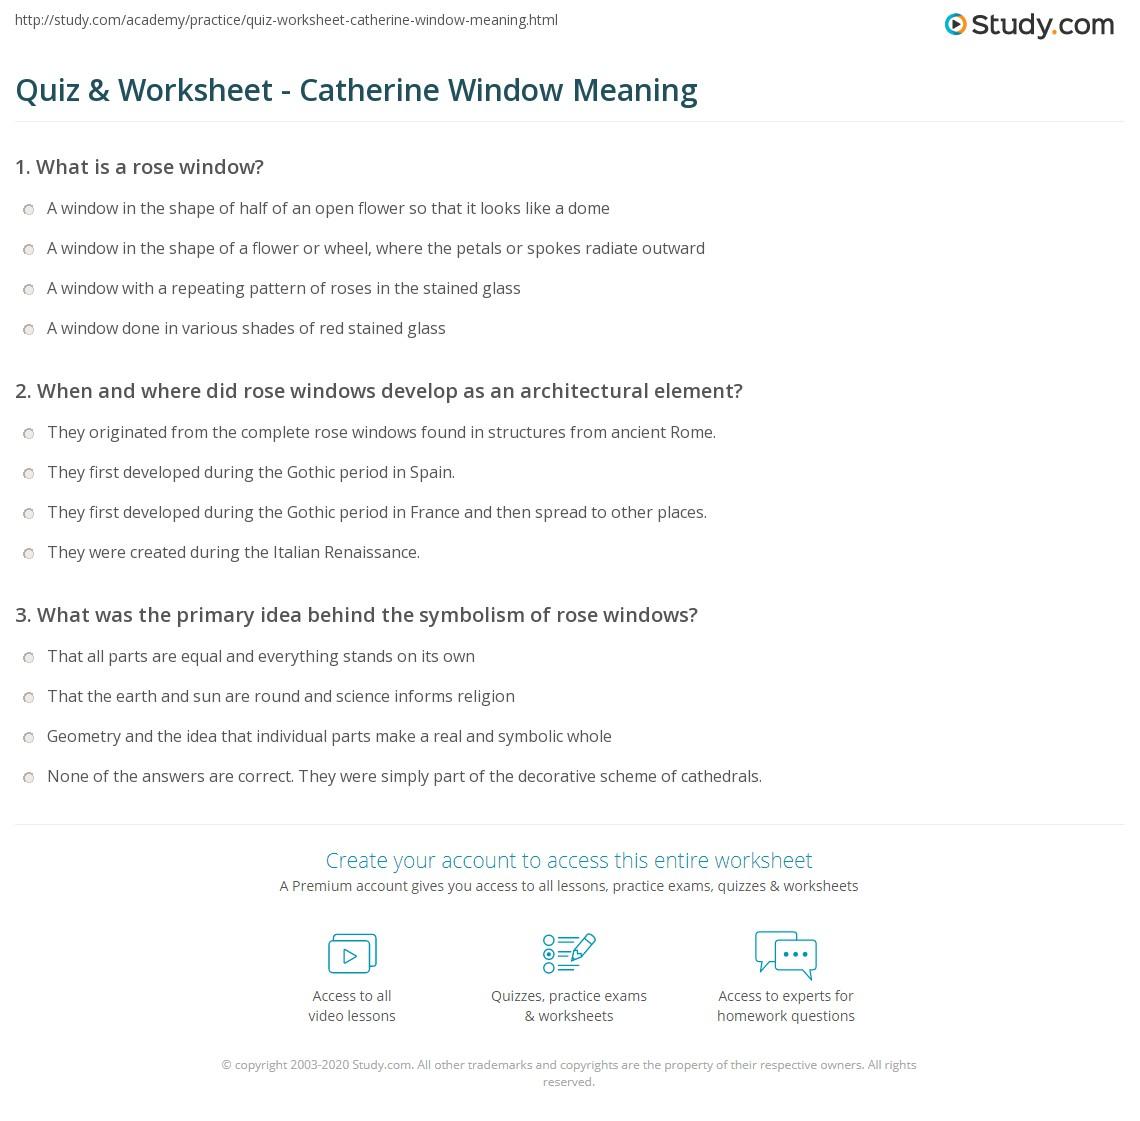 Quiz & Worksheet - Catherine Window Meaning | Study.com